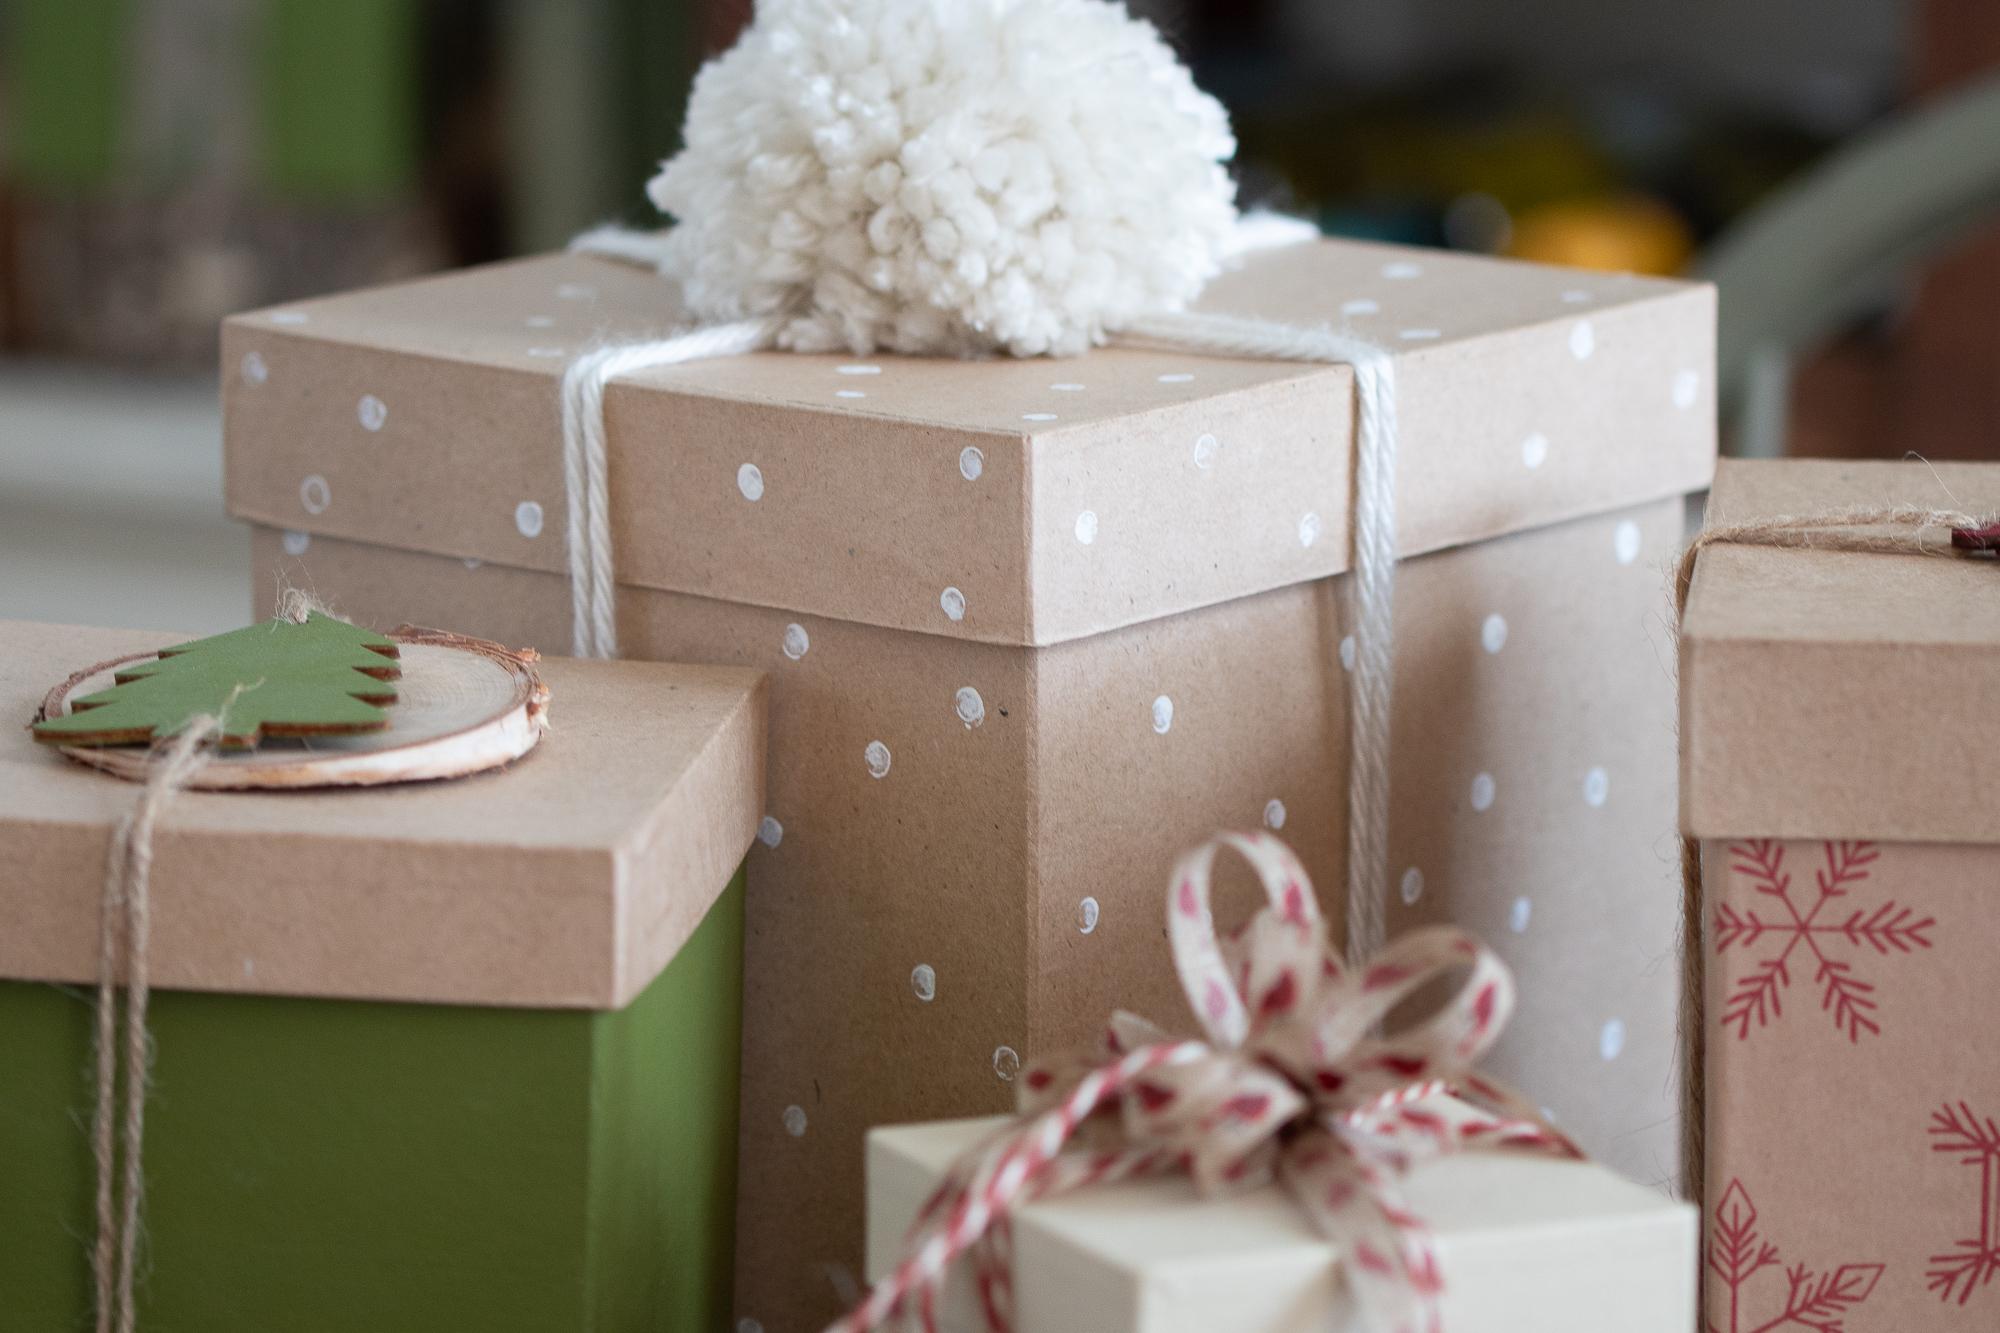 box1 (1 of 1)